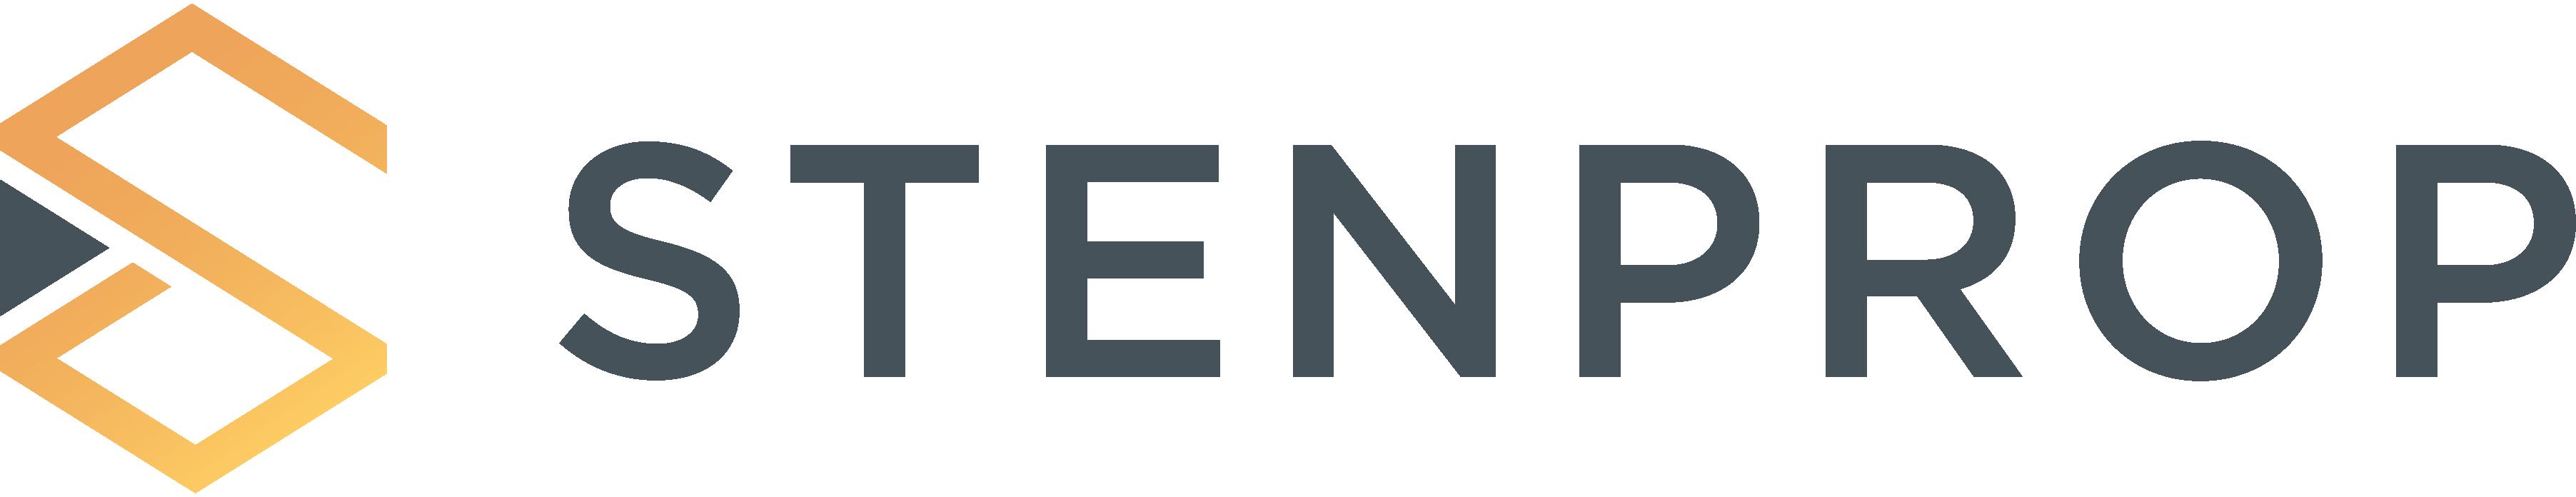 STENPROP LIMITED Logo